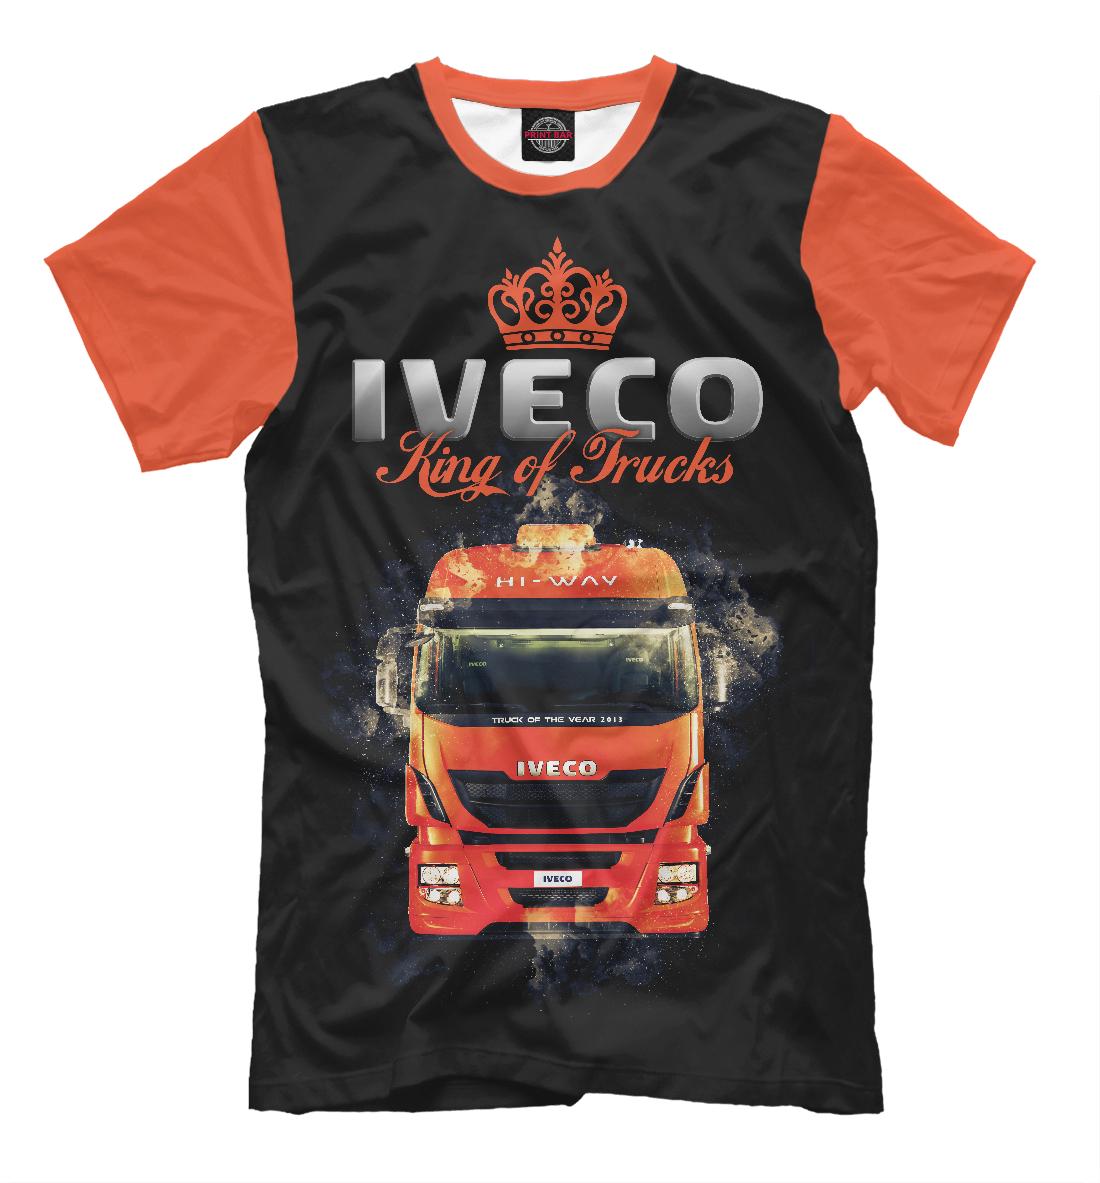 Купить IVECO - король грузовиков, Printbar, Футболки, GRZ-502294-fut-2